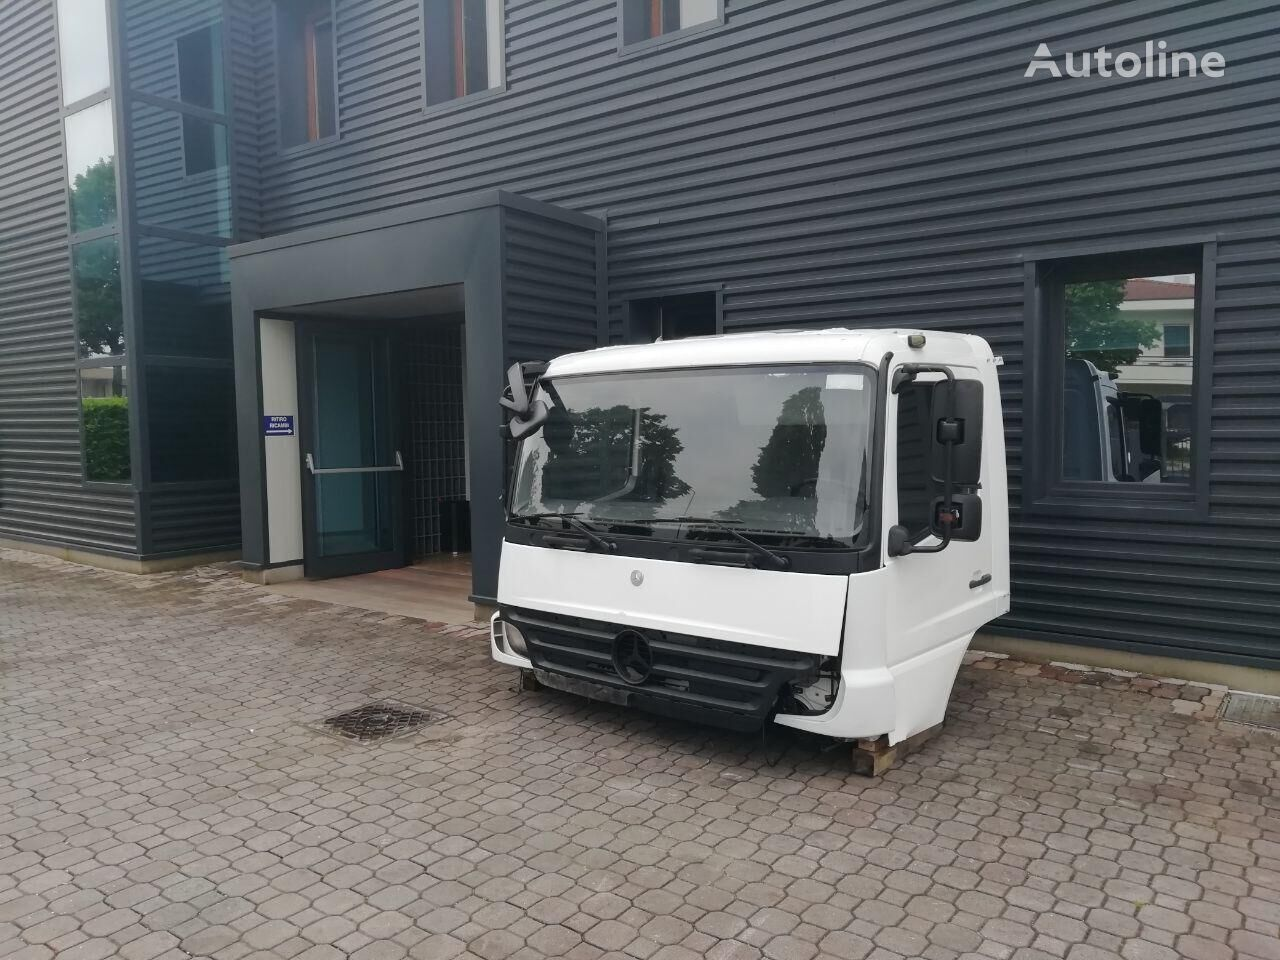 MERCEDES-BENZ Atego Fahrerhaus Kabine cabin for MERCEDES-BENZ Cabin ATEGO Euro 4 Euro 5 tractor unit